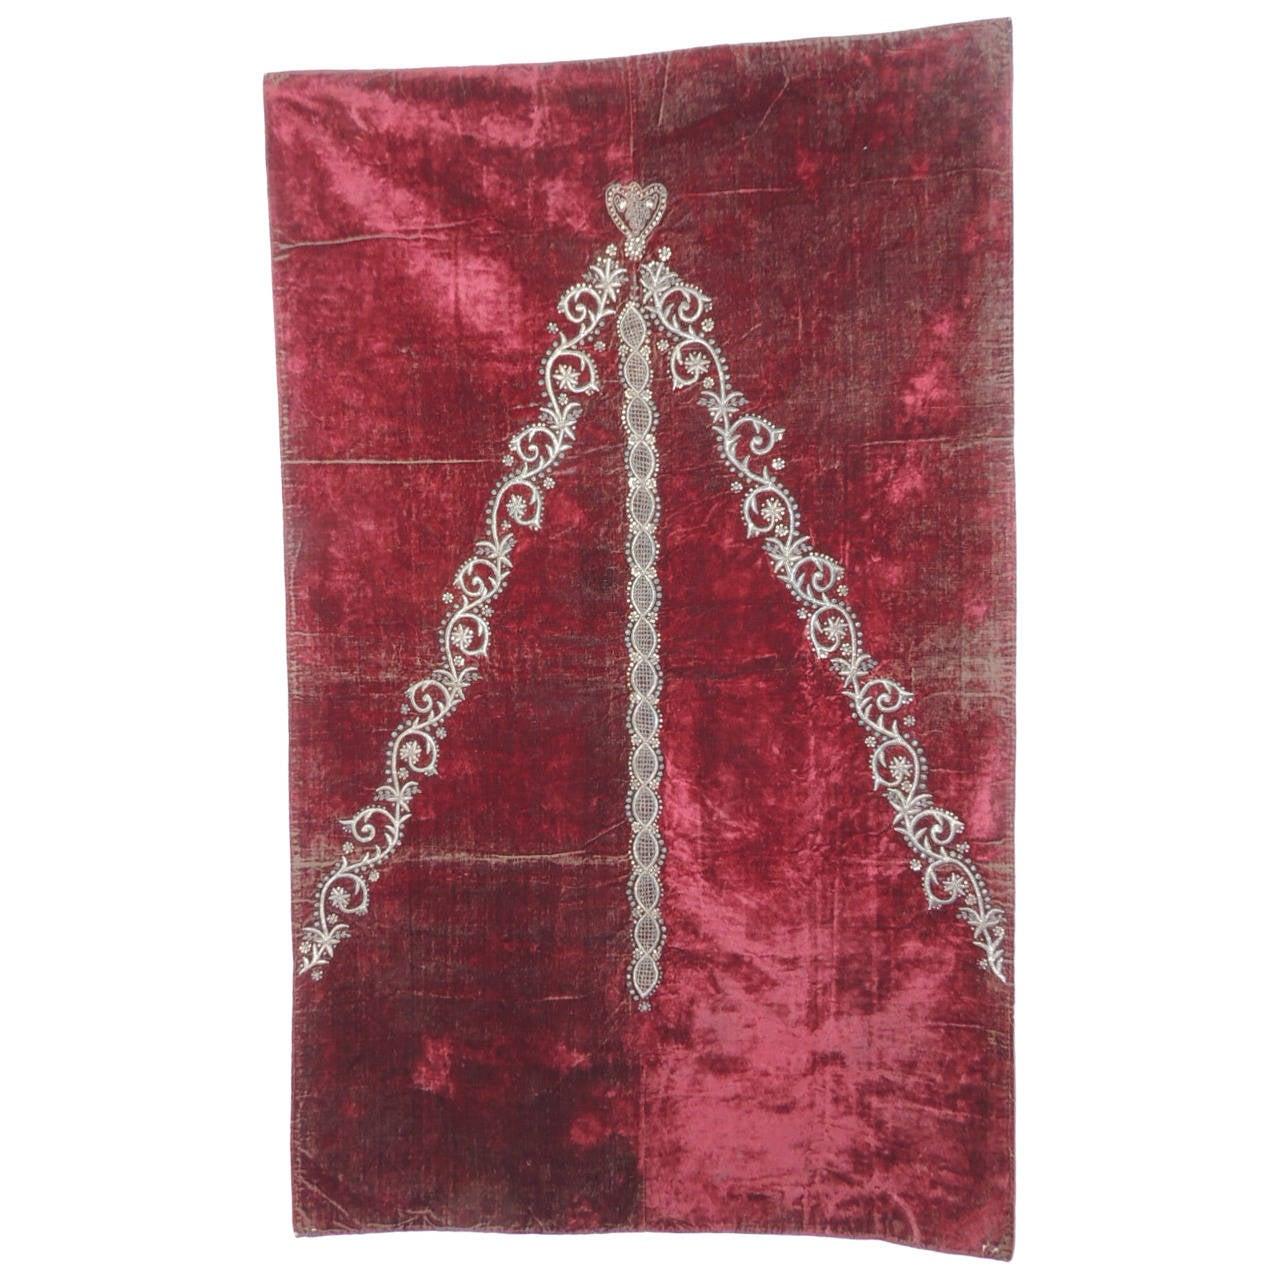 19th Century Bindalli Textile With Metallic Embroidery